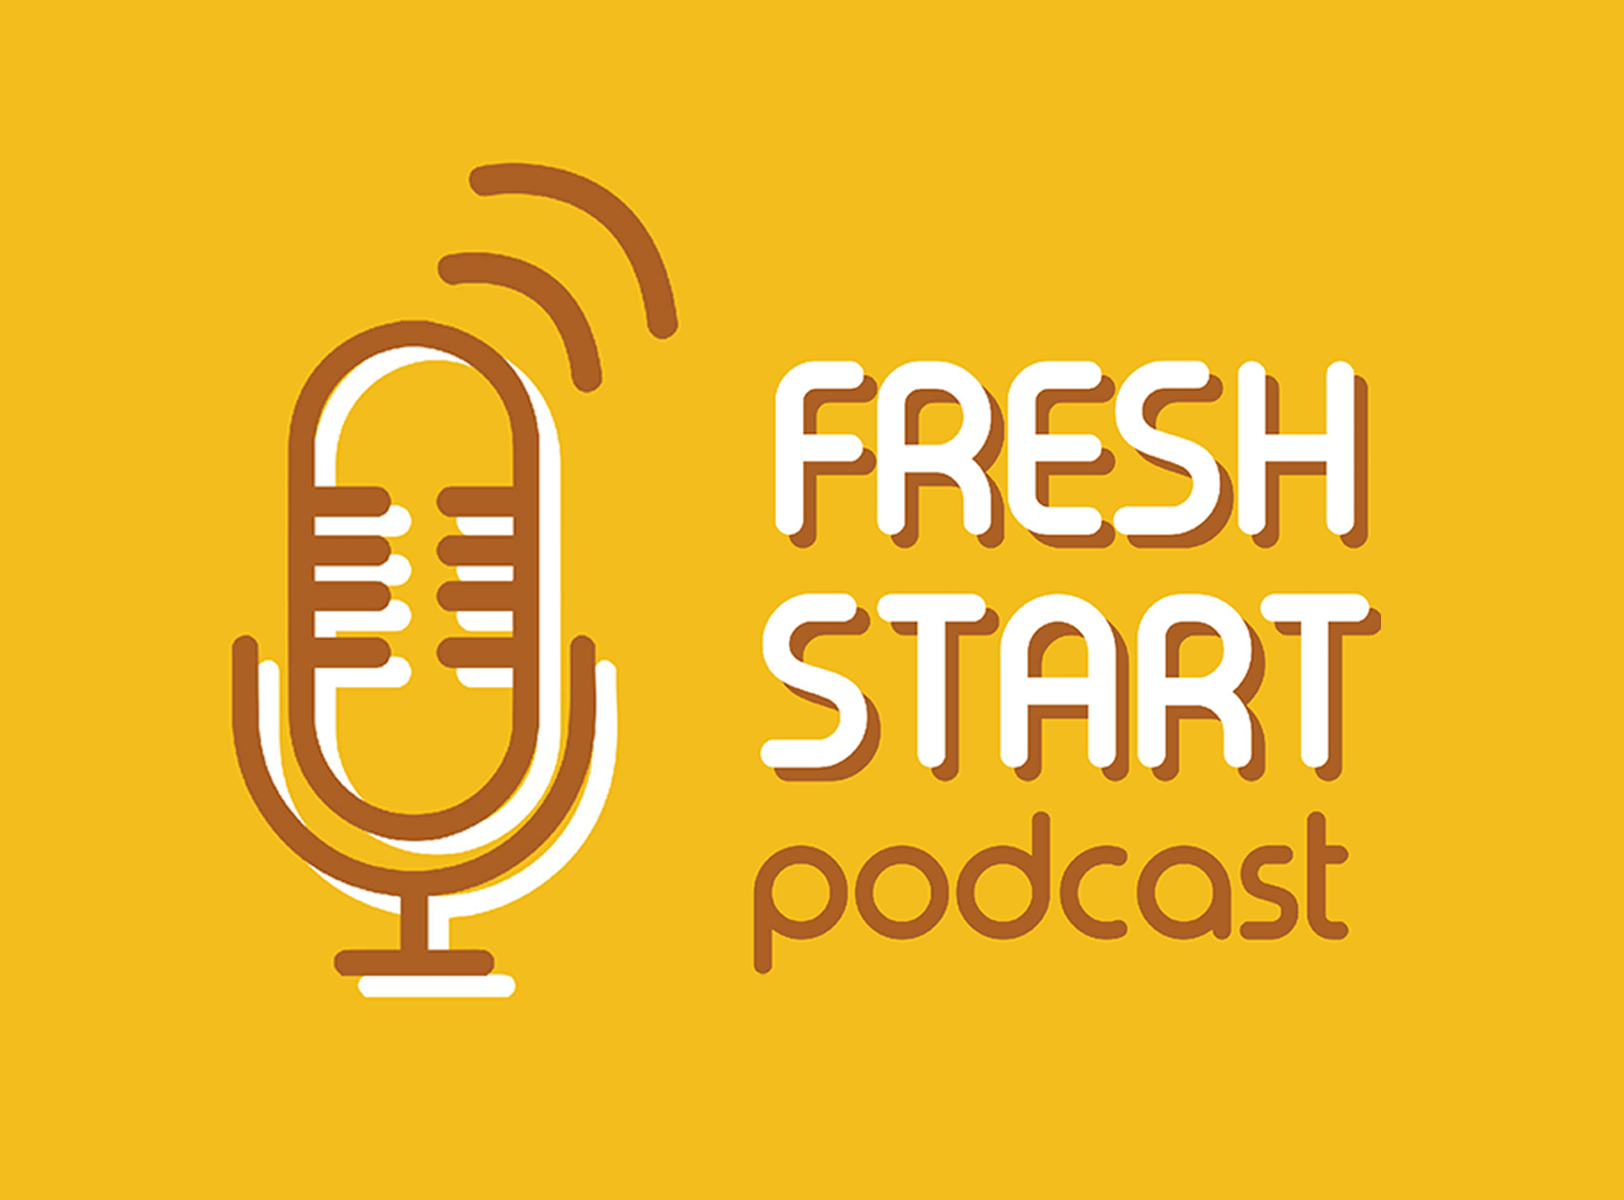 Fresh Start: Podcast News (9/25/2019 Wed.)